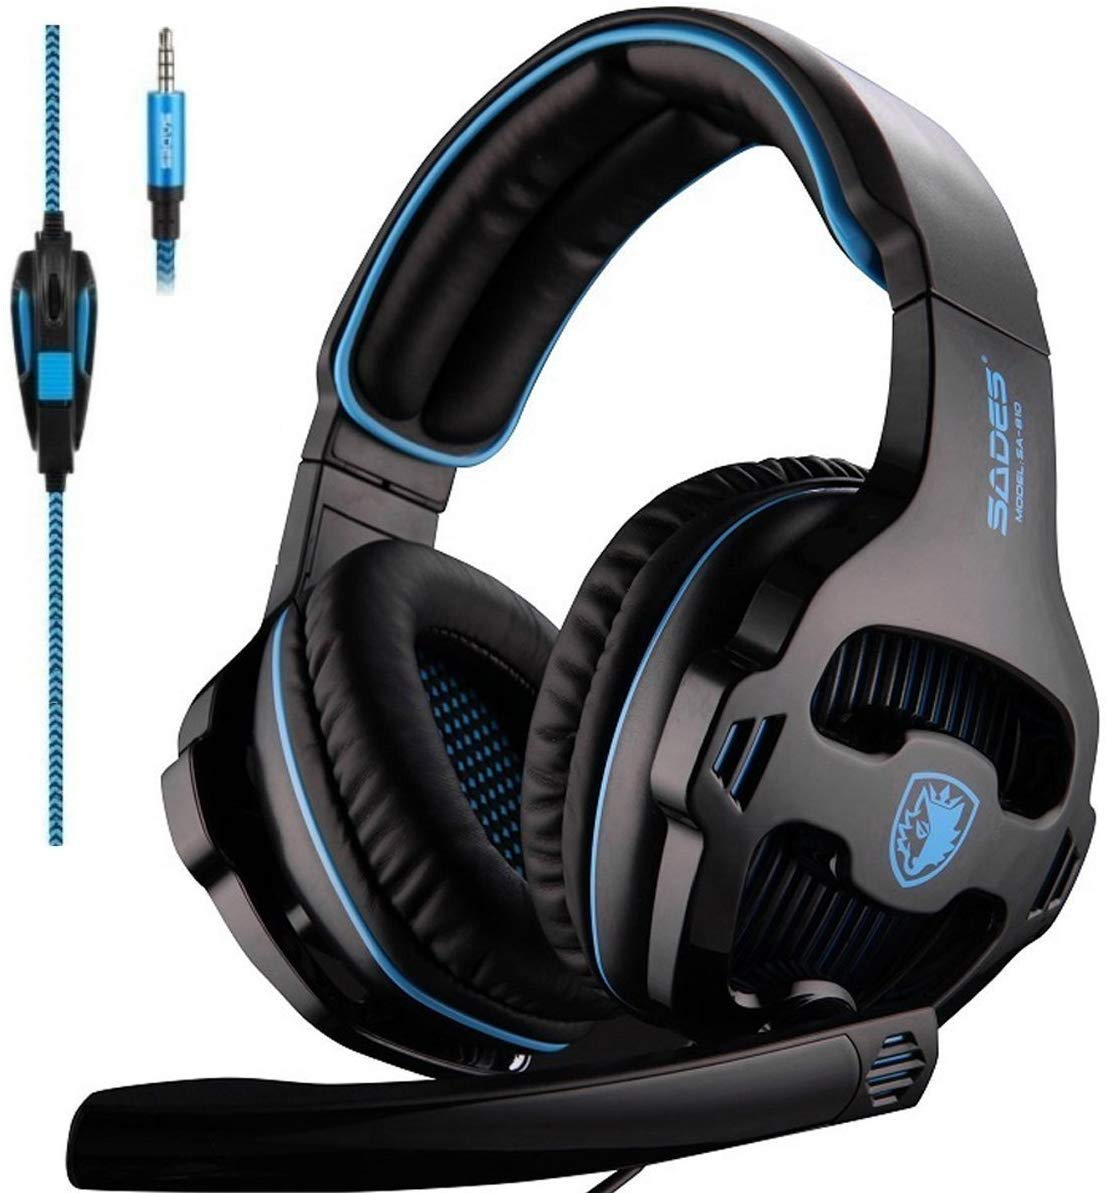 SADES Headphones Microphone Nintendo Playstation